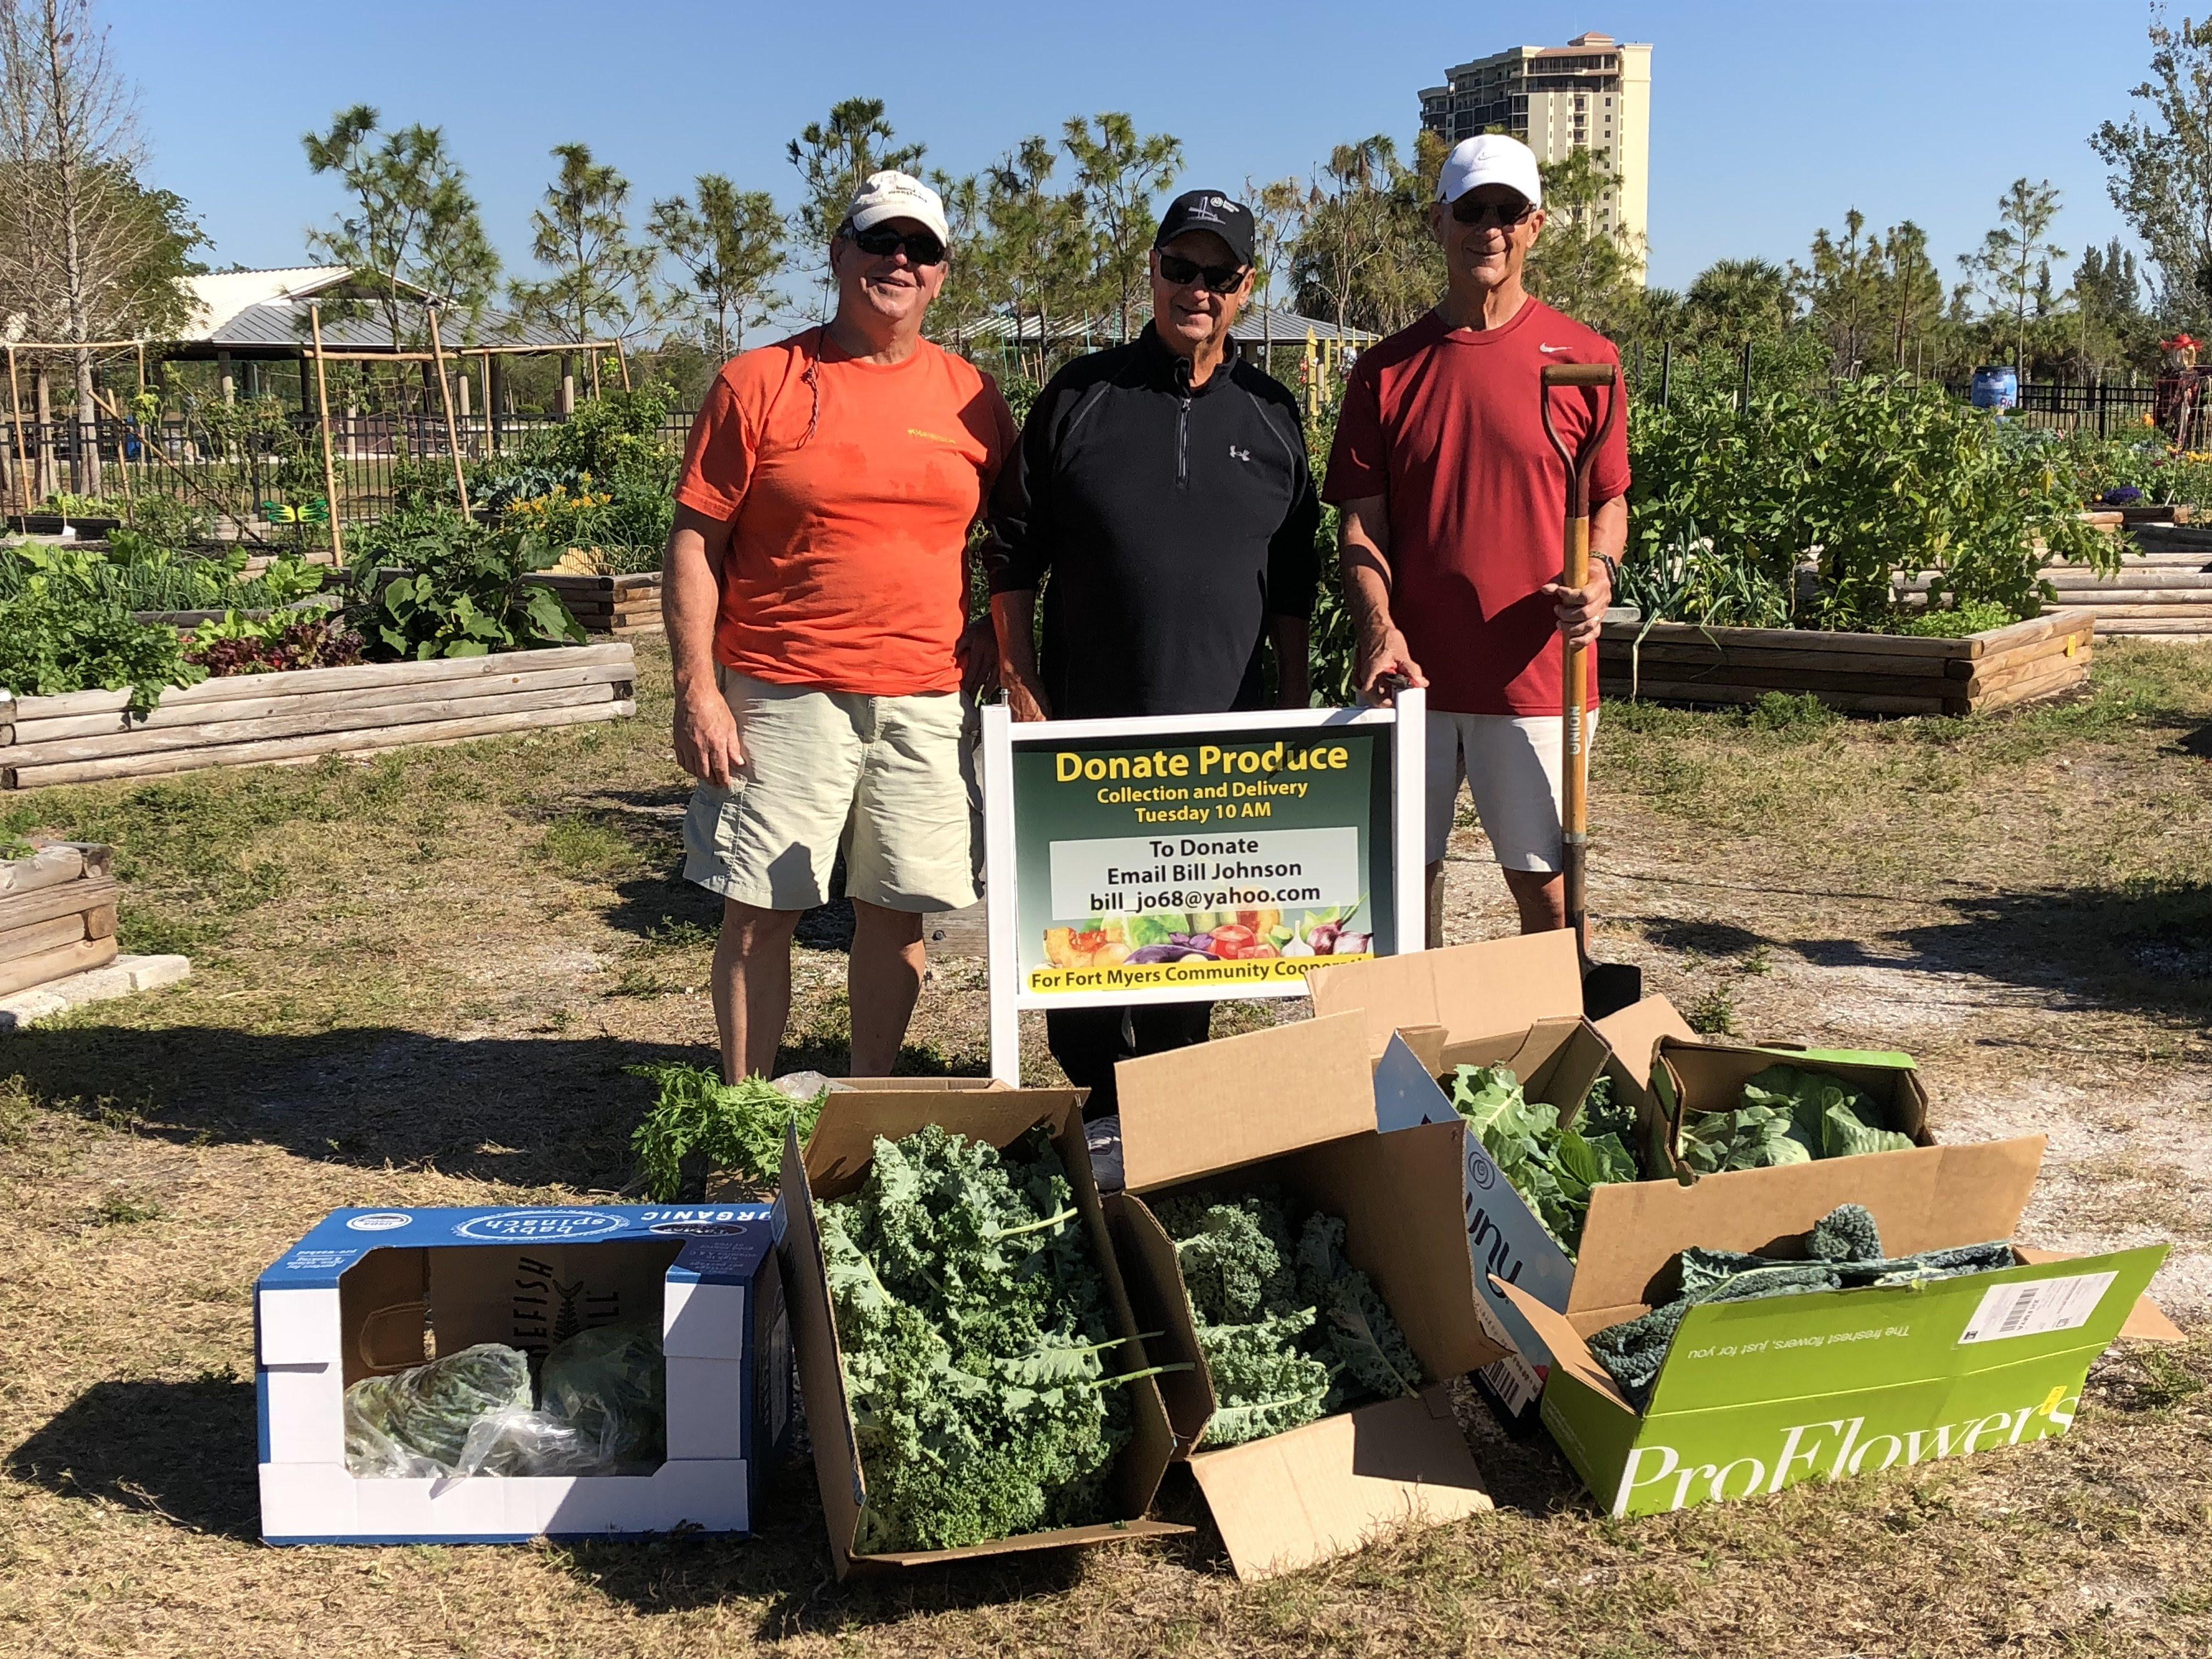 Community Garden at Lakes Park donates food